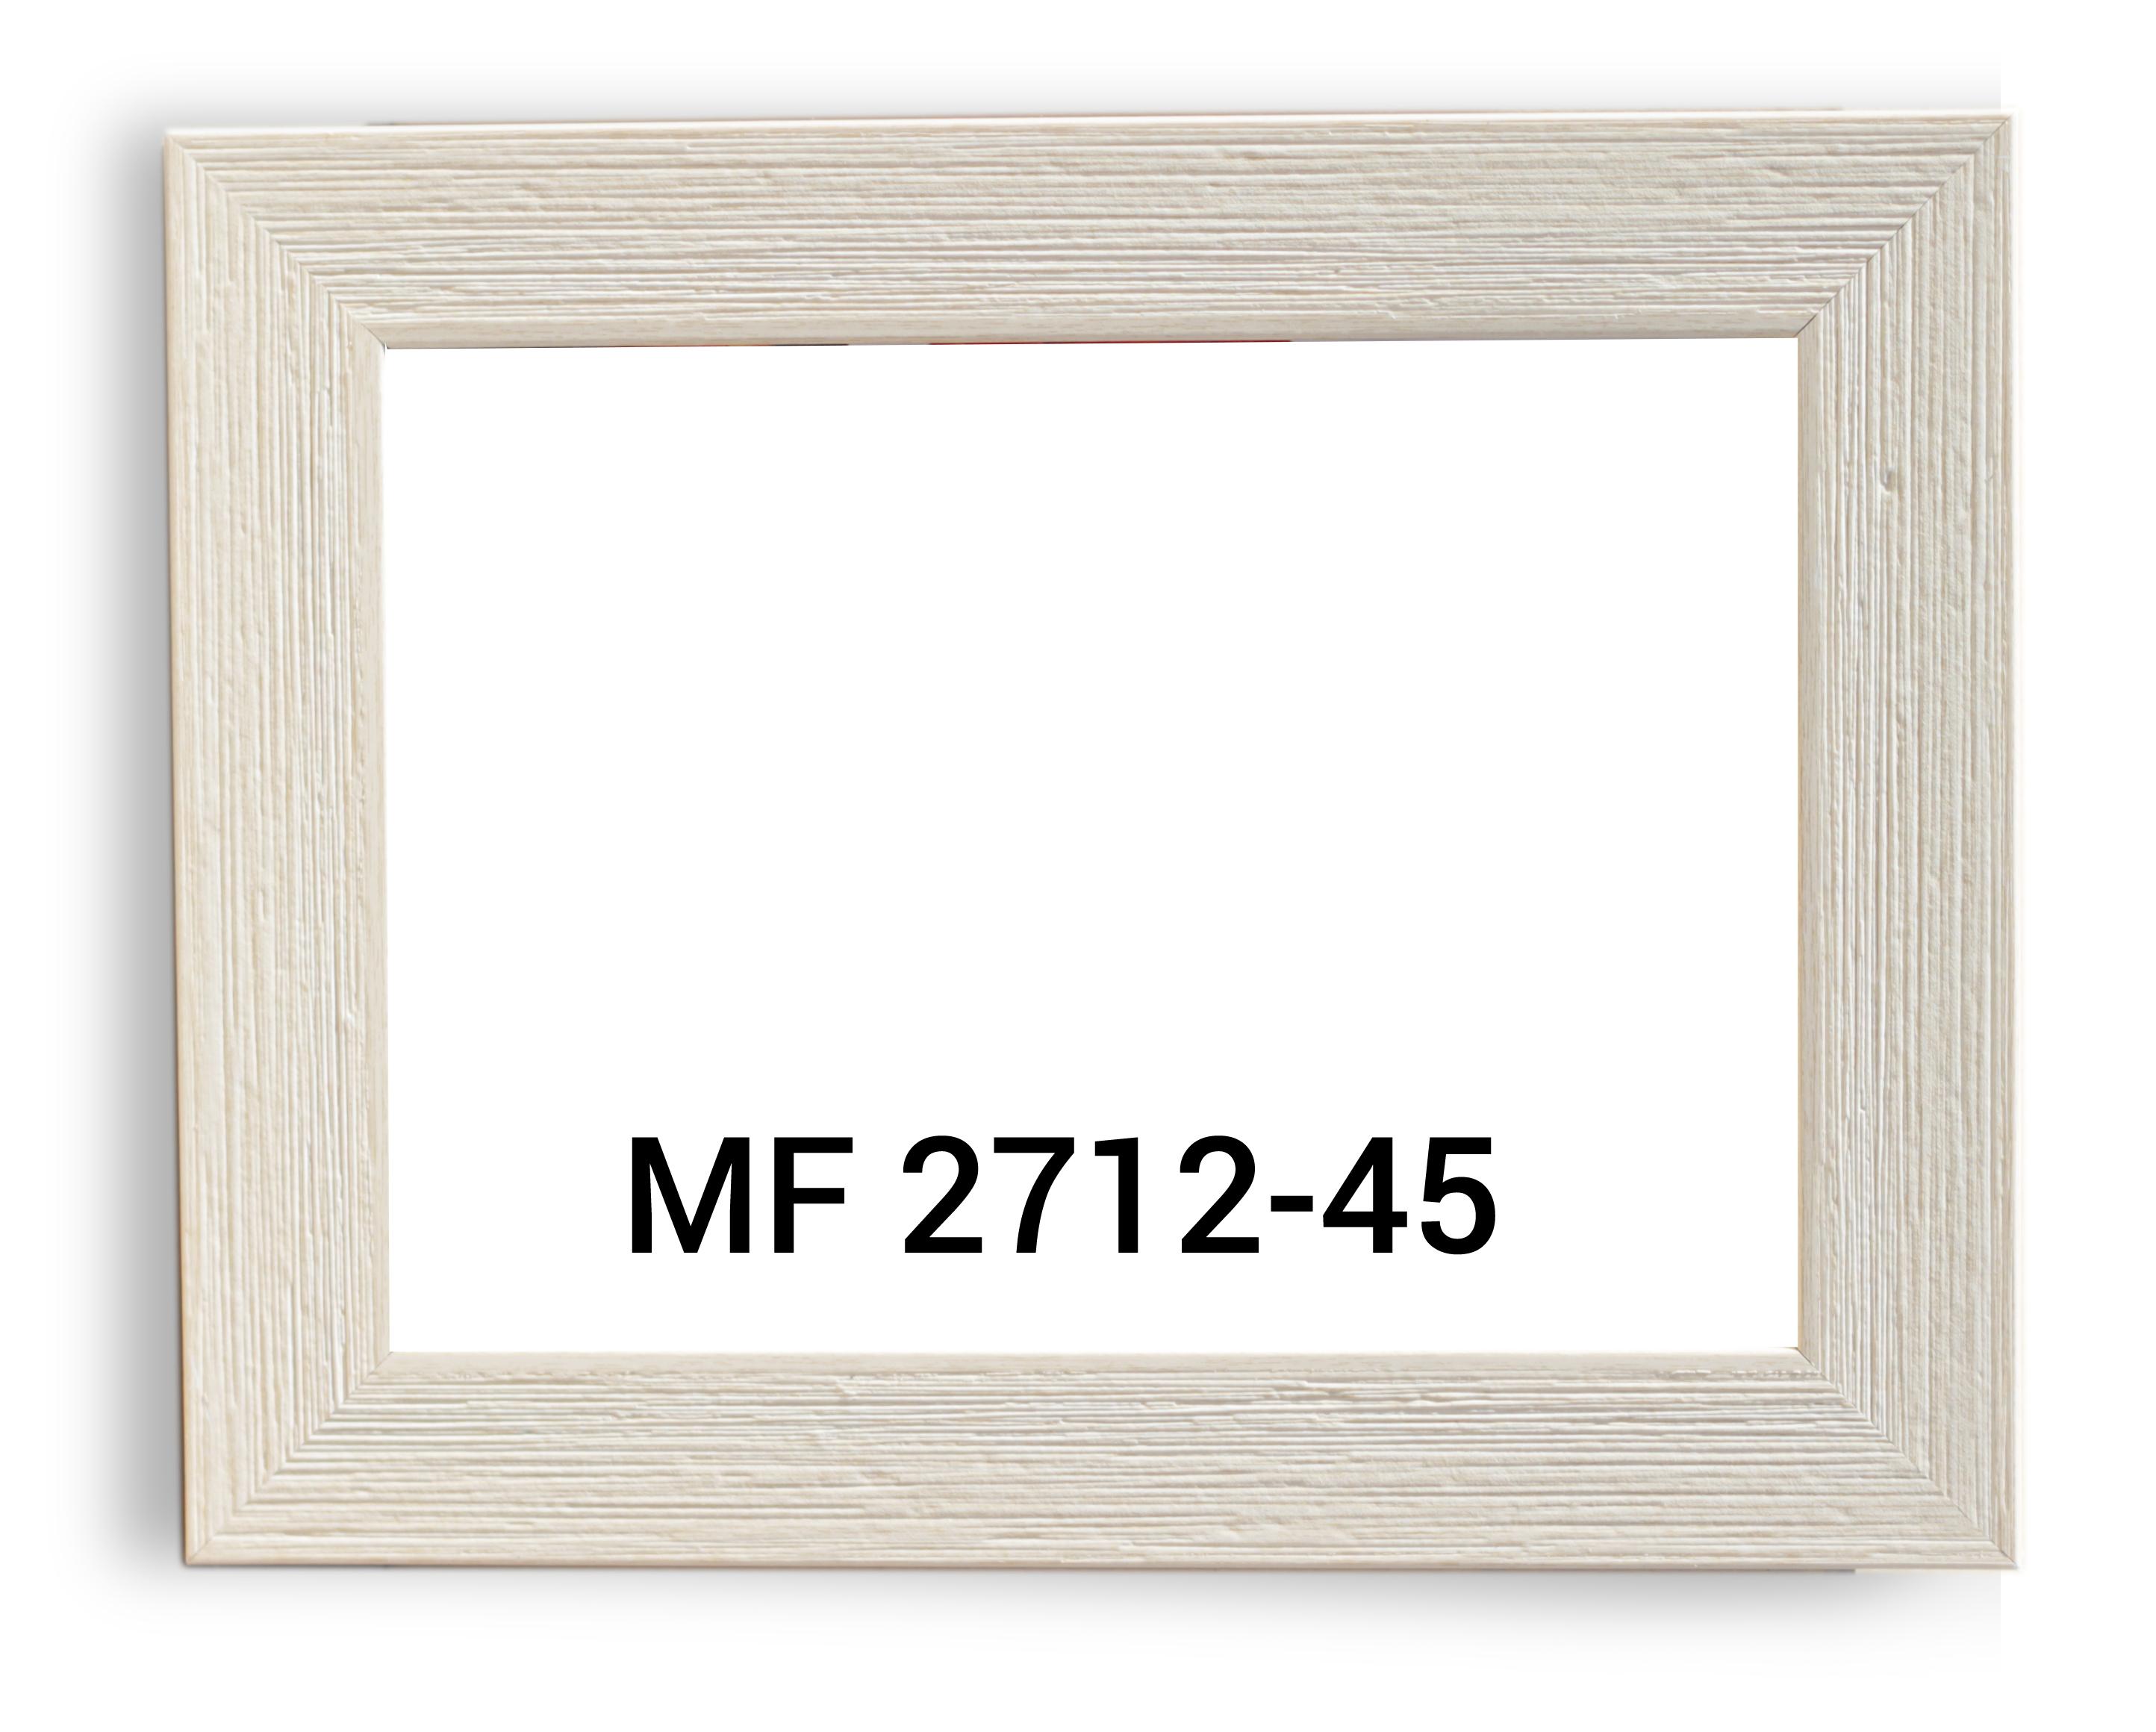 2712-45